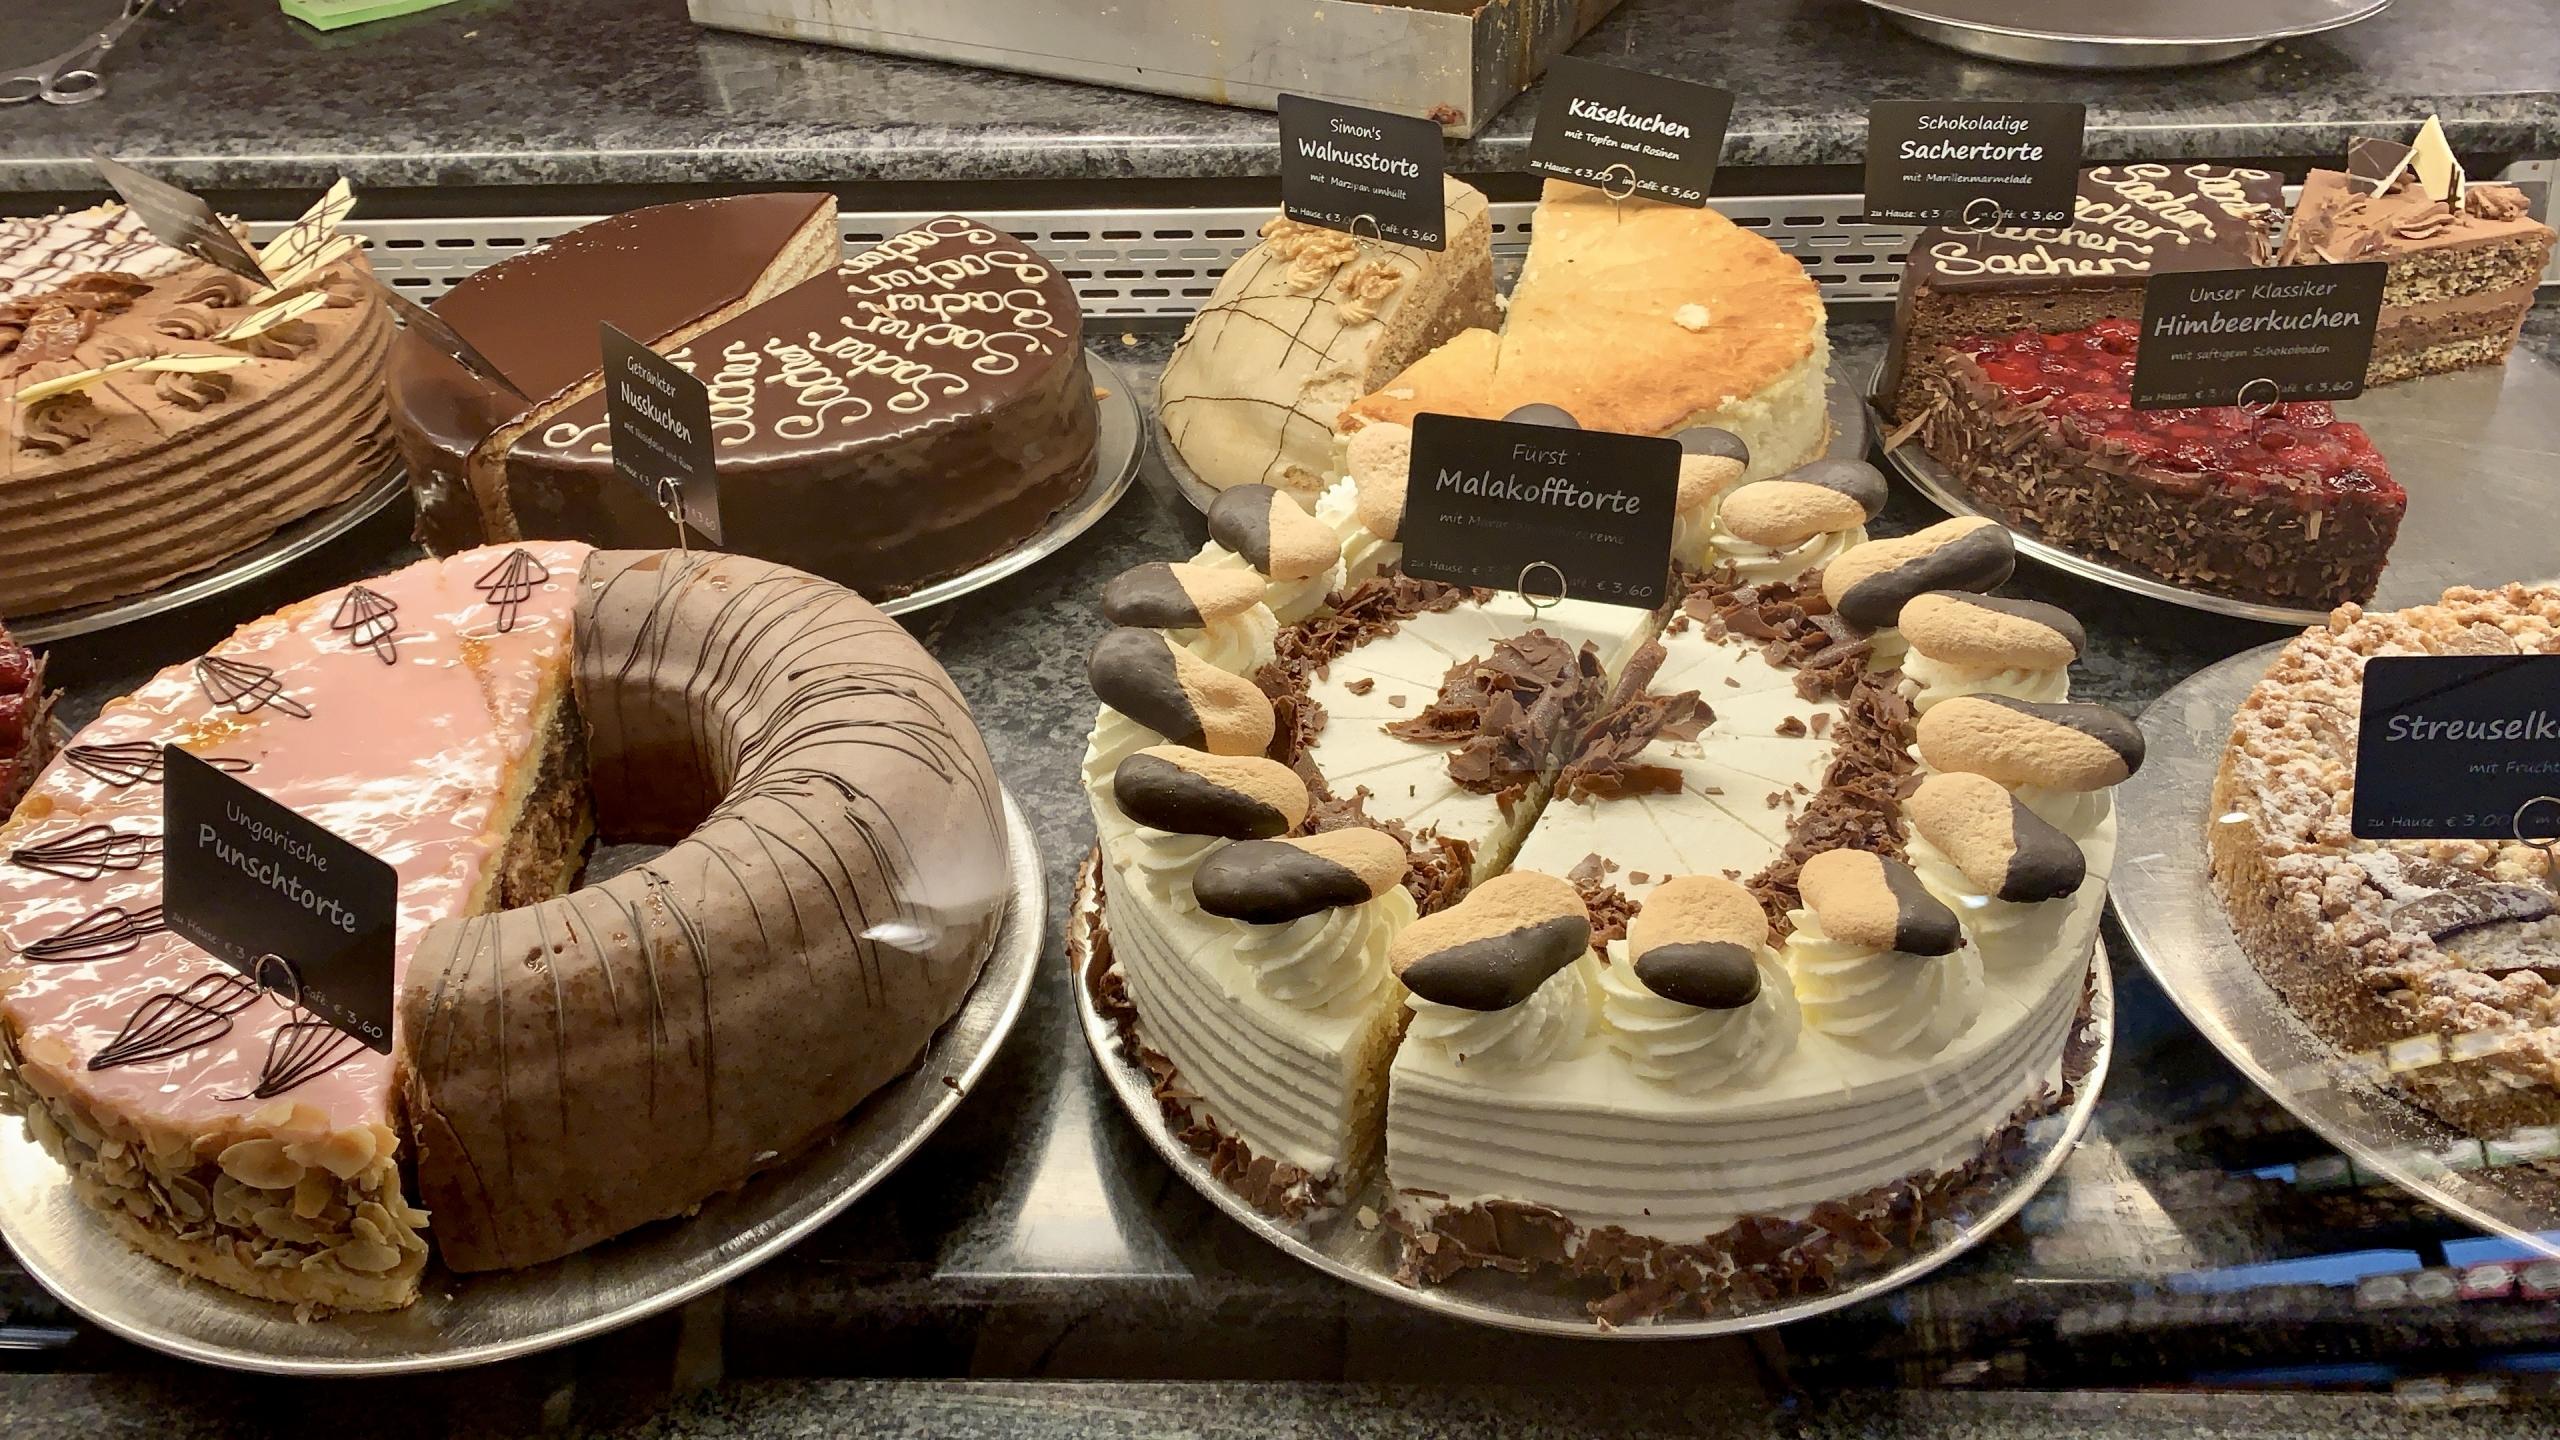 Bakery visiting Passau